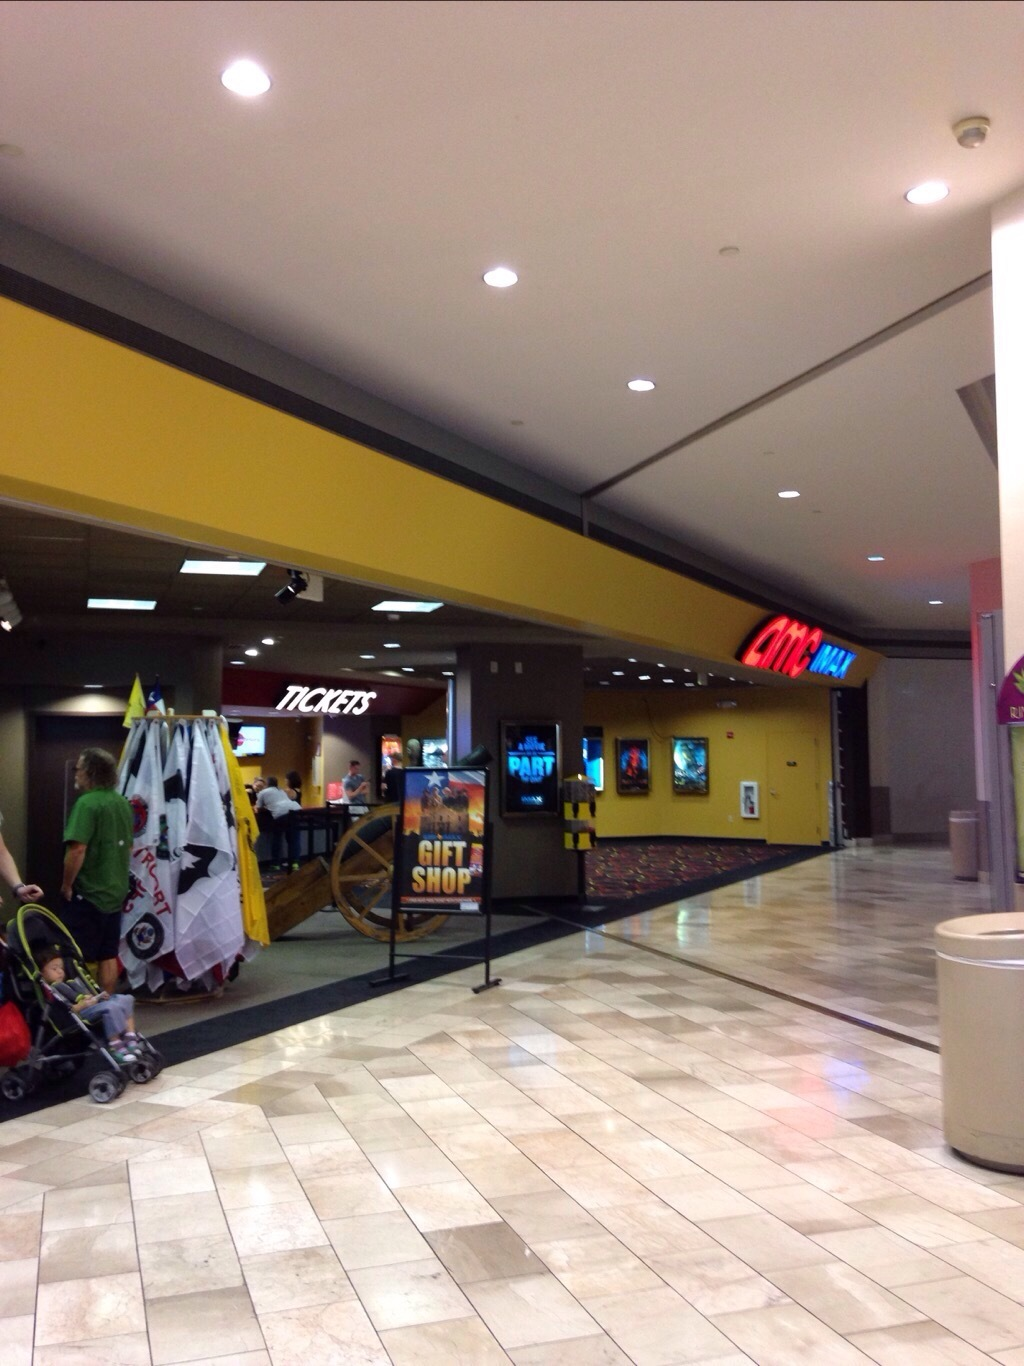 Alamo IMAX Theatre Rivercenter  San Antonio TX  Groupon